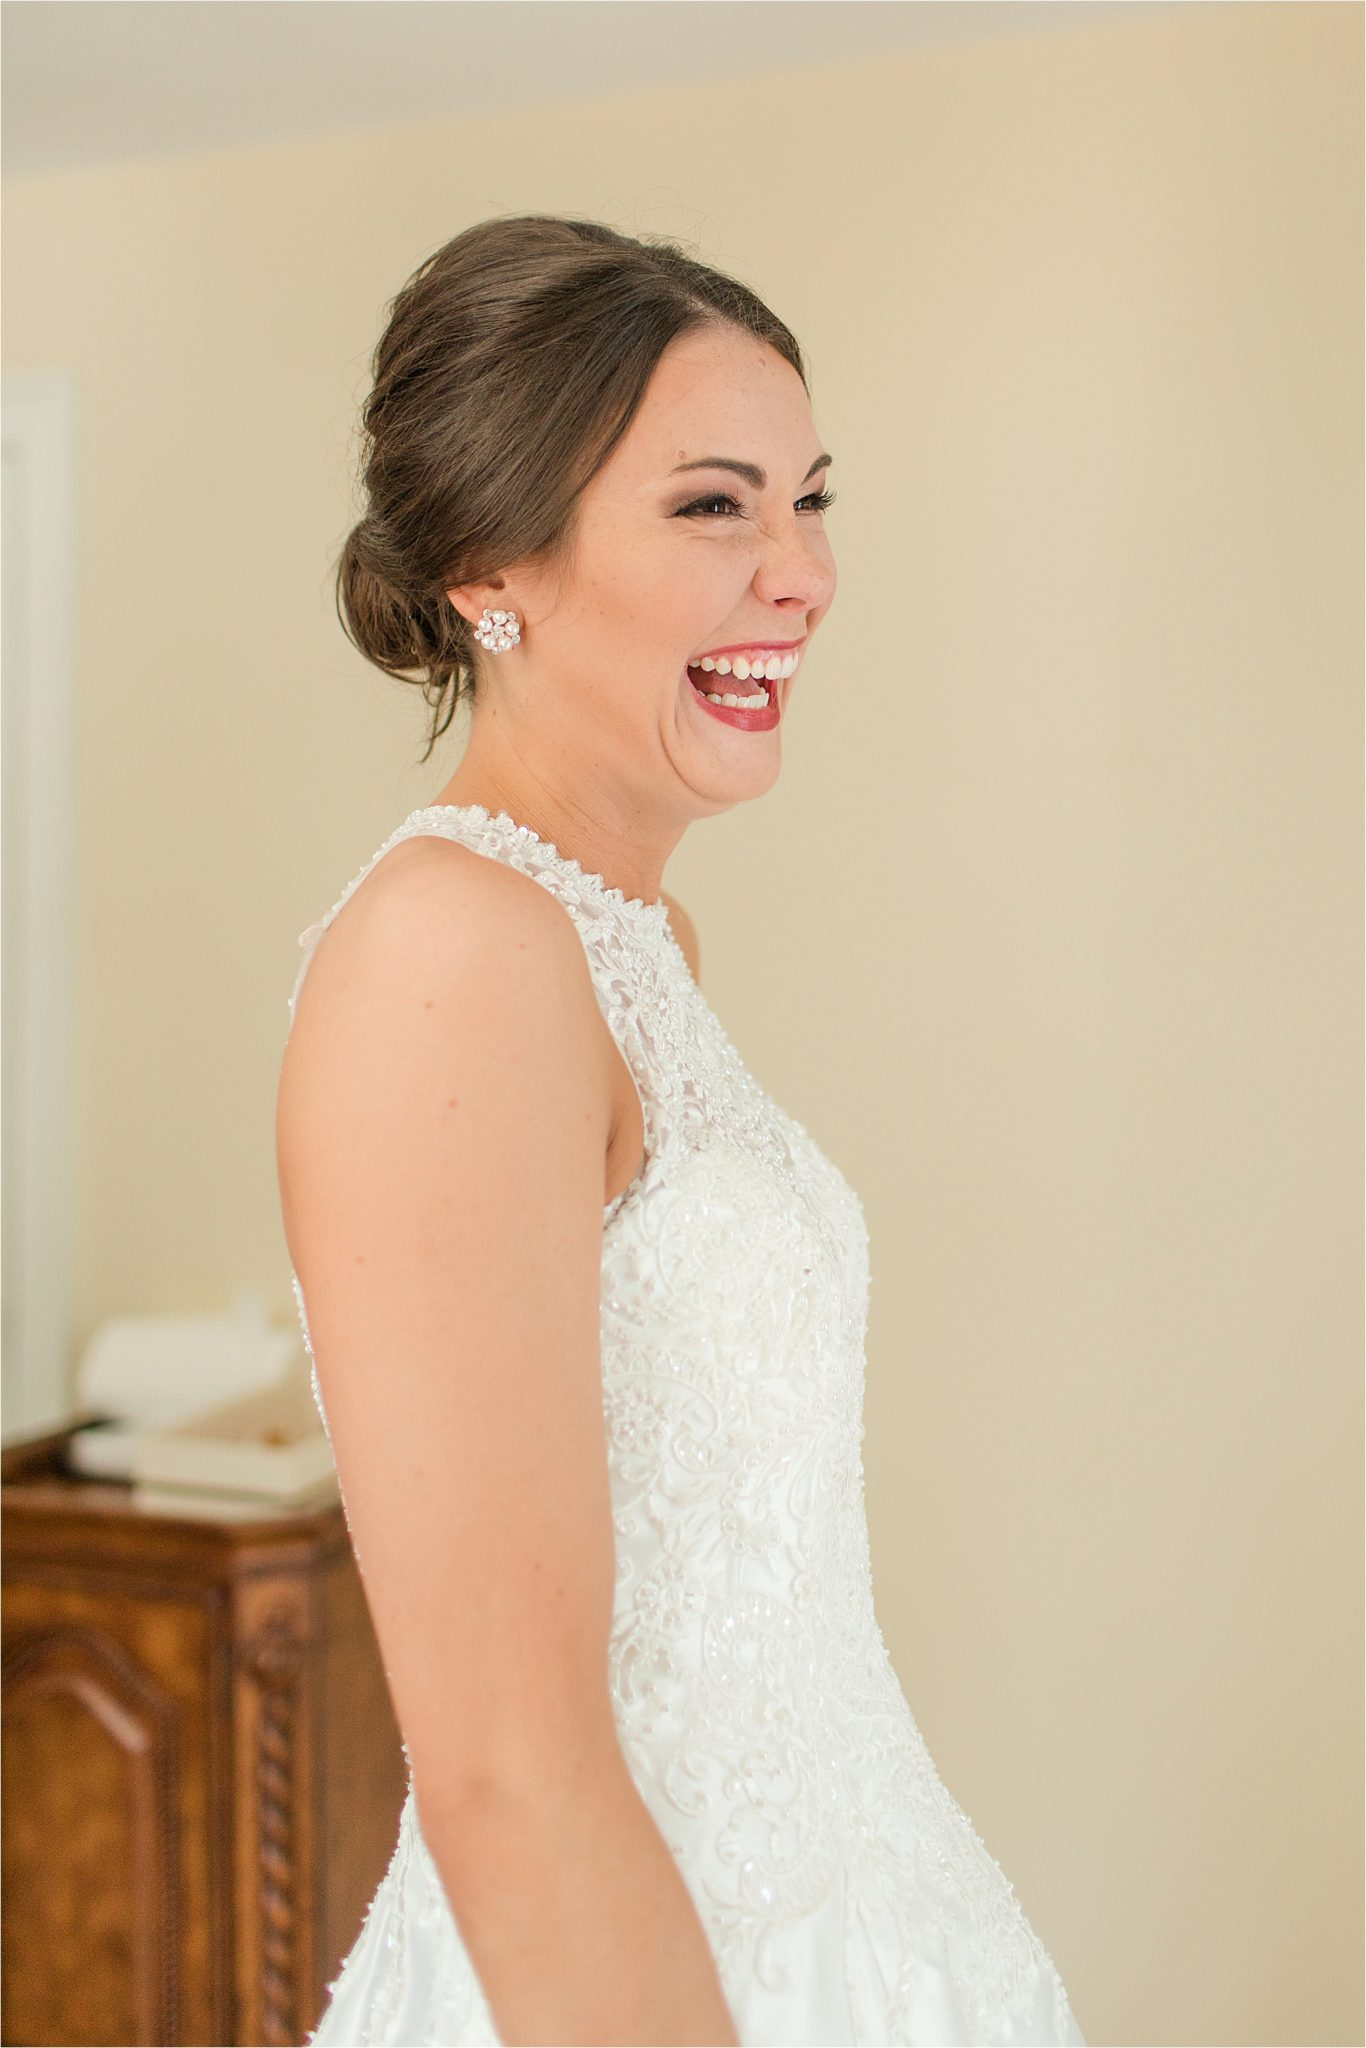 Sonnet House, Birmingham Alabama Wedding Photographer, Bridal portrait, Wedding dress reveal